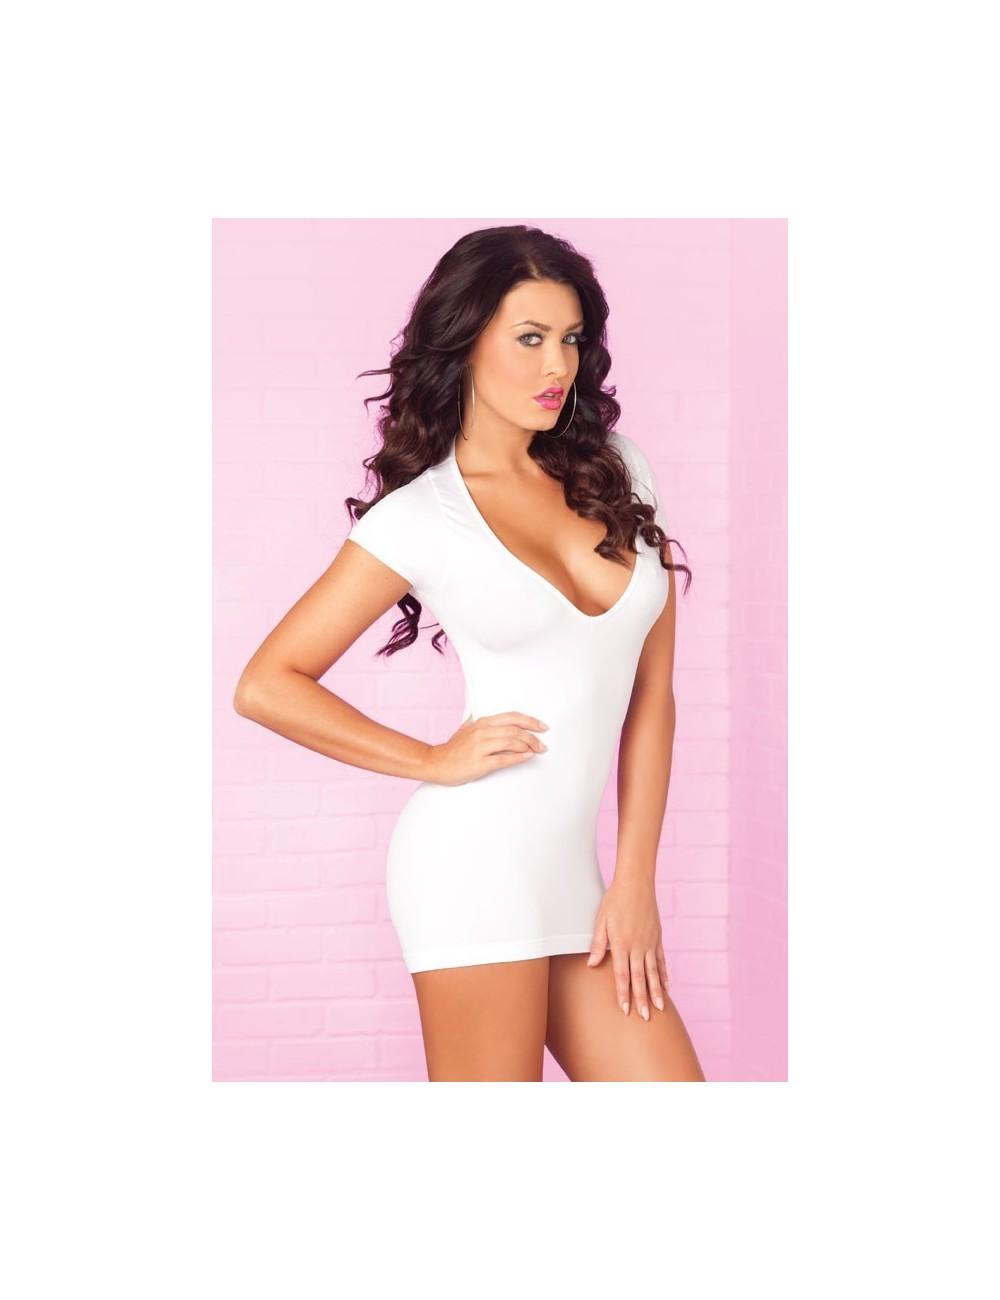 Lingerie - Robes et jupes sexy - Mini robe sexy blanche avec dentelle Party in the Back - PLK25051-WHT - René Rofé